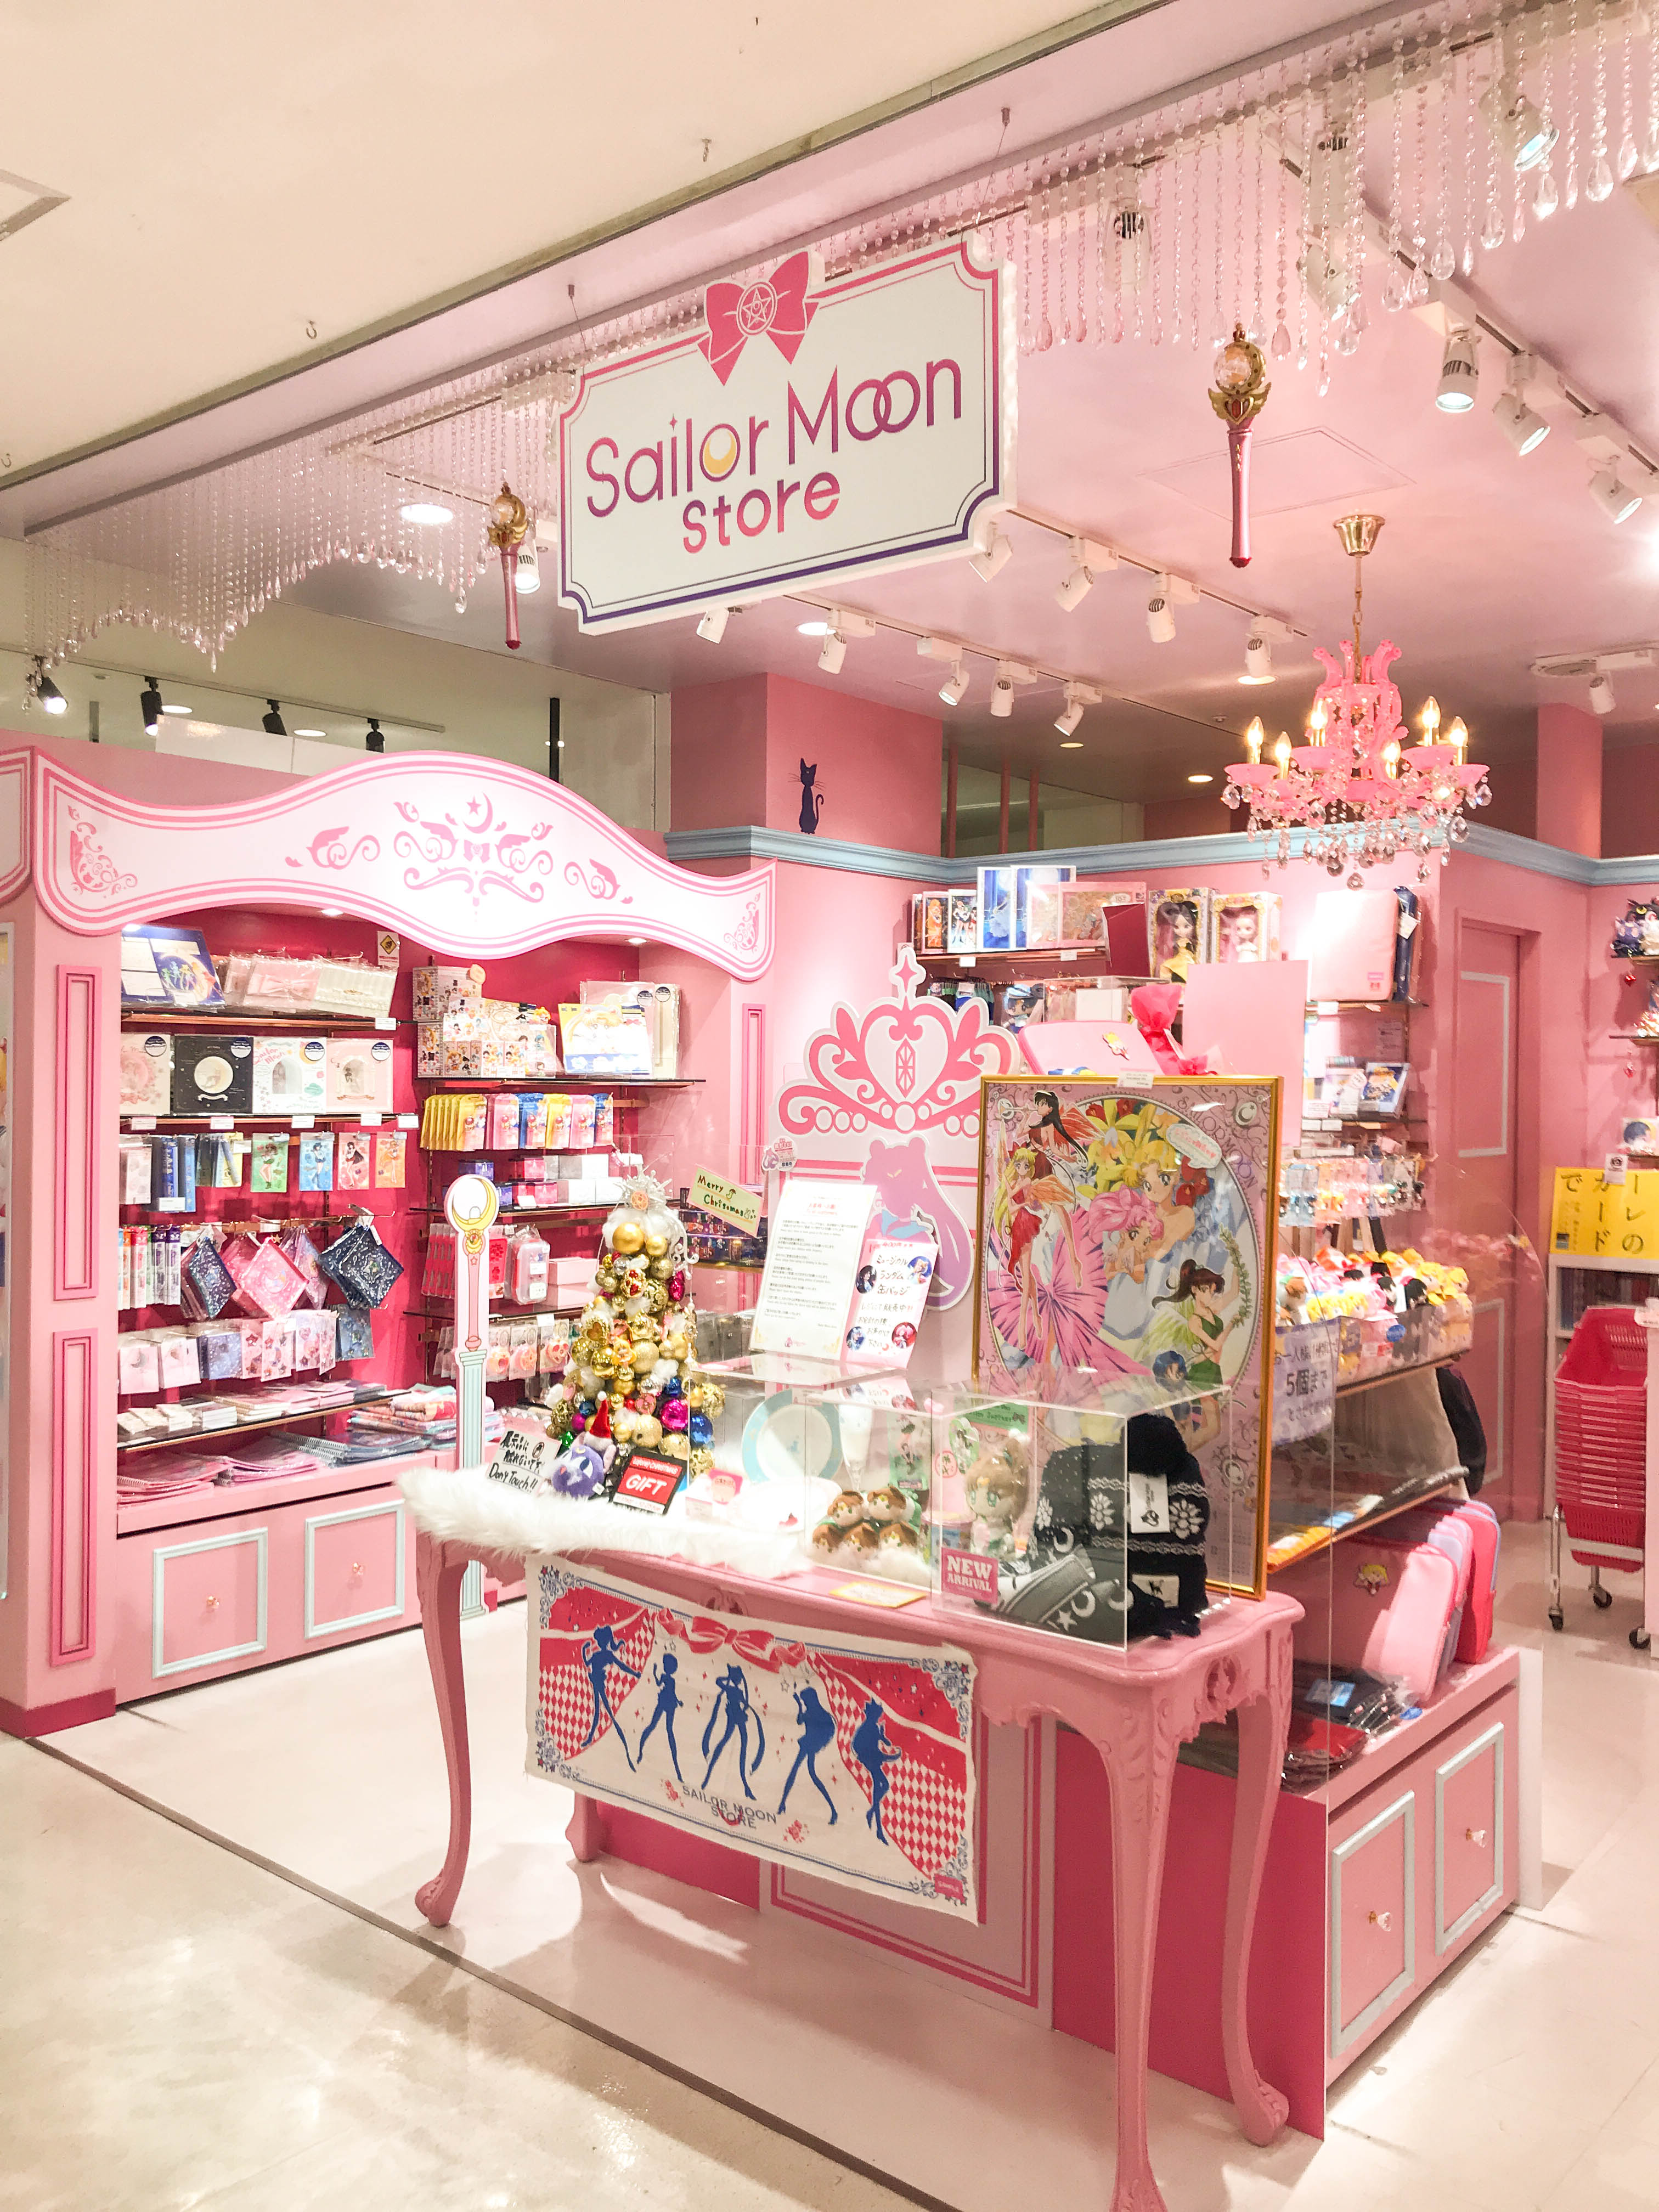 Laforet luxury feminine department store Sailor Moon anime manga boutique for cosplay